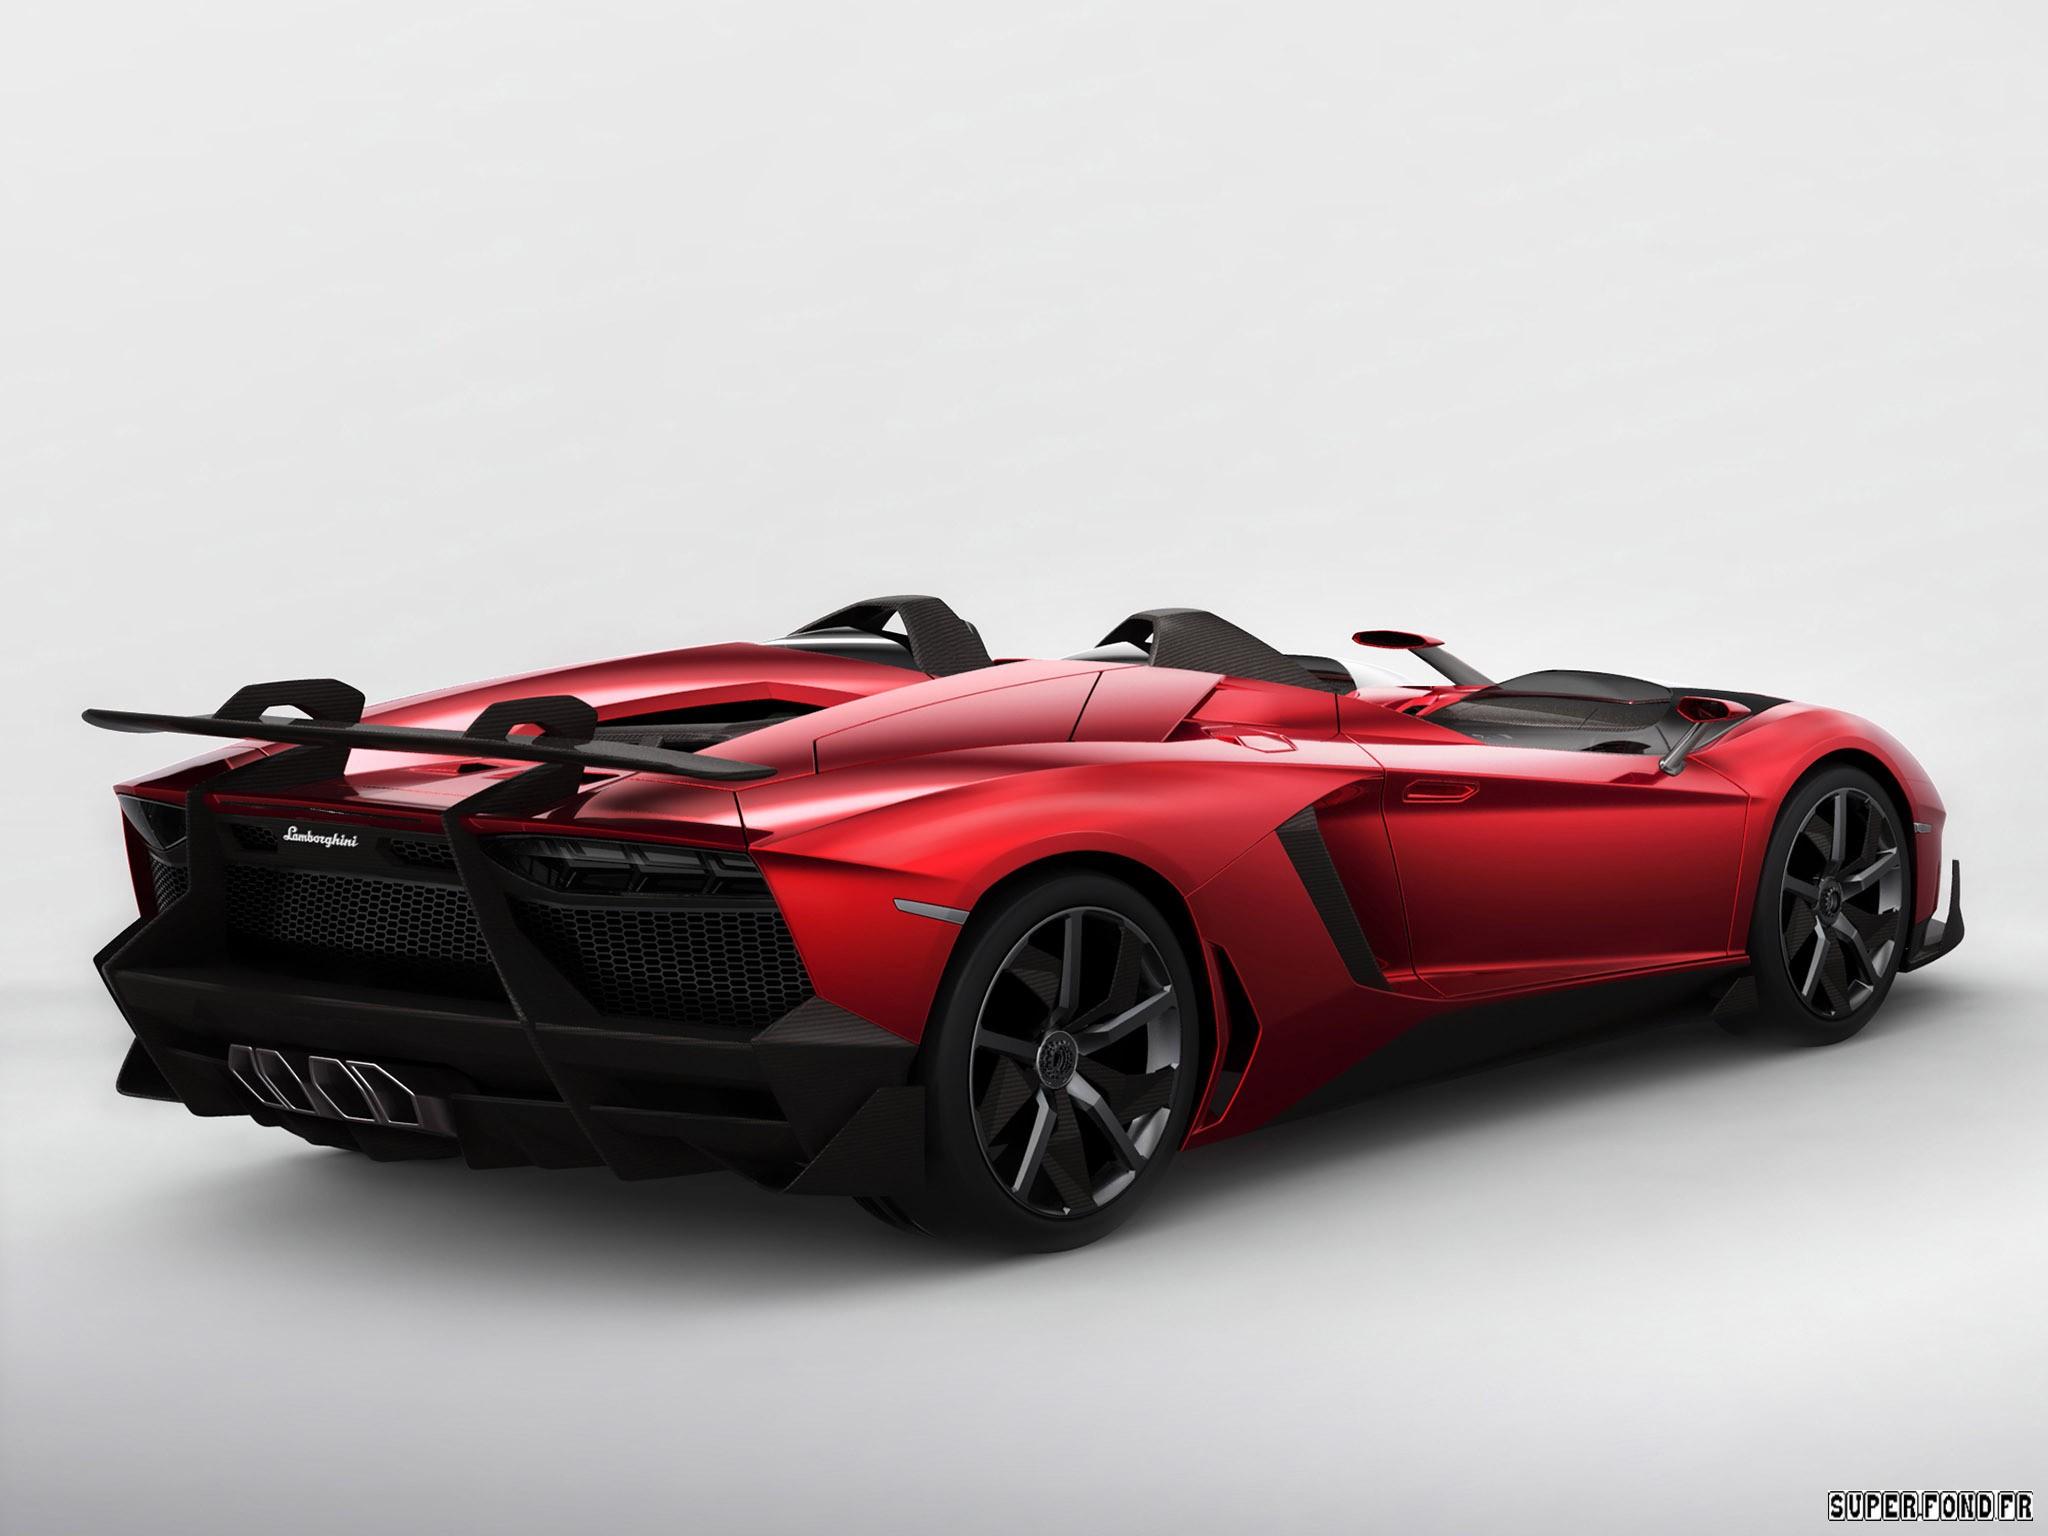 Lamborghini Aventador J 2012